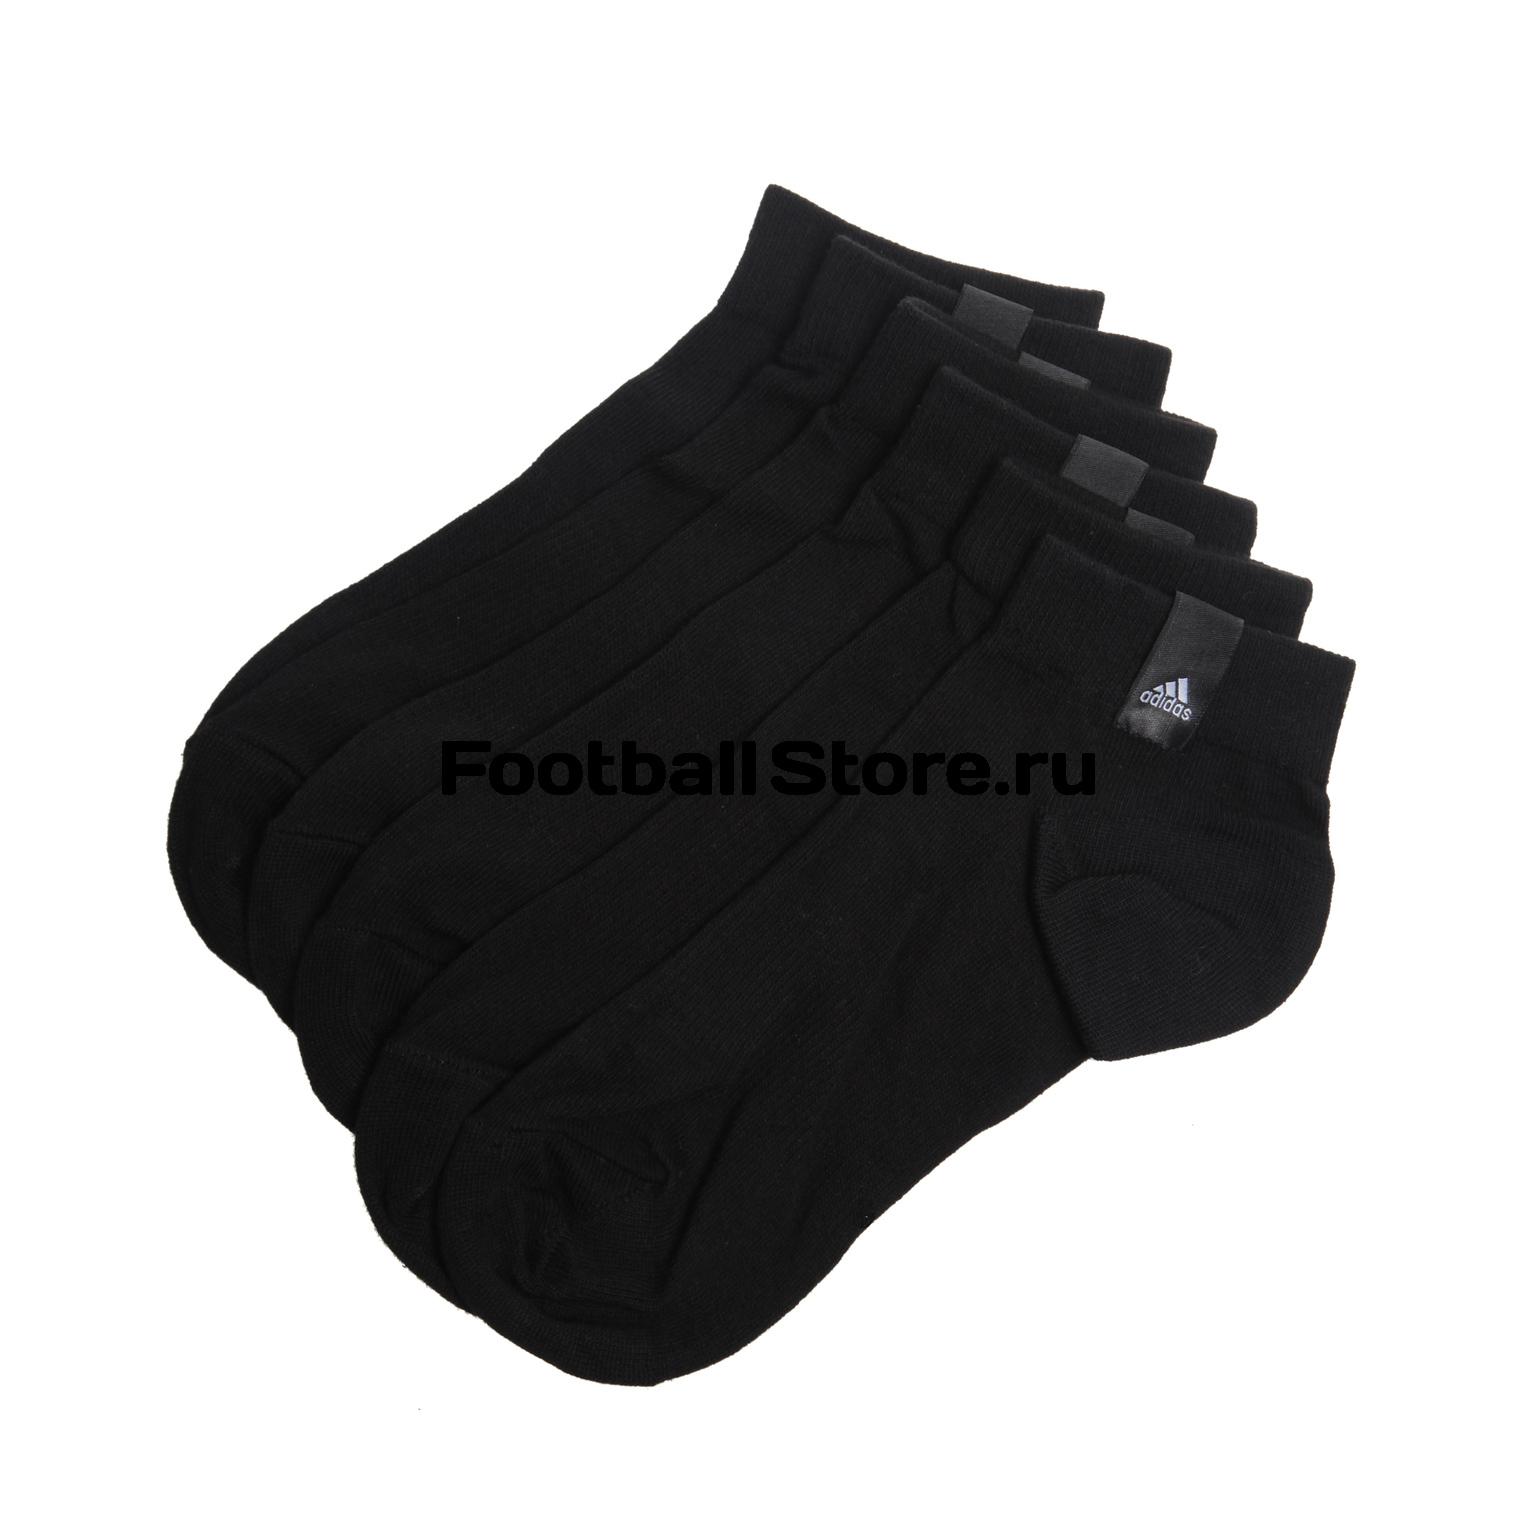 Комплект носков Adidas Label Thin Ankle 3-Pack AA2484 носки adidas носки per la ankle 3p